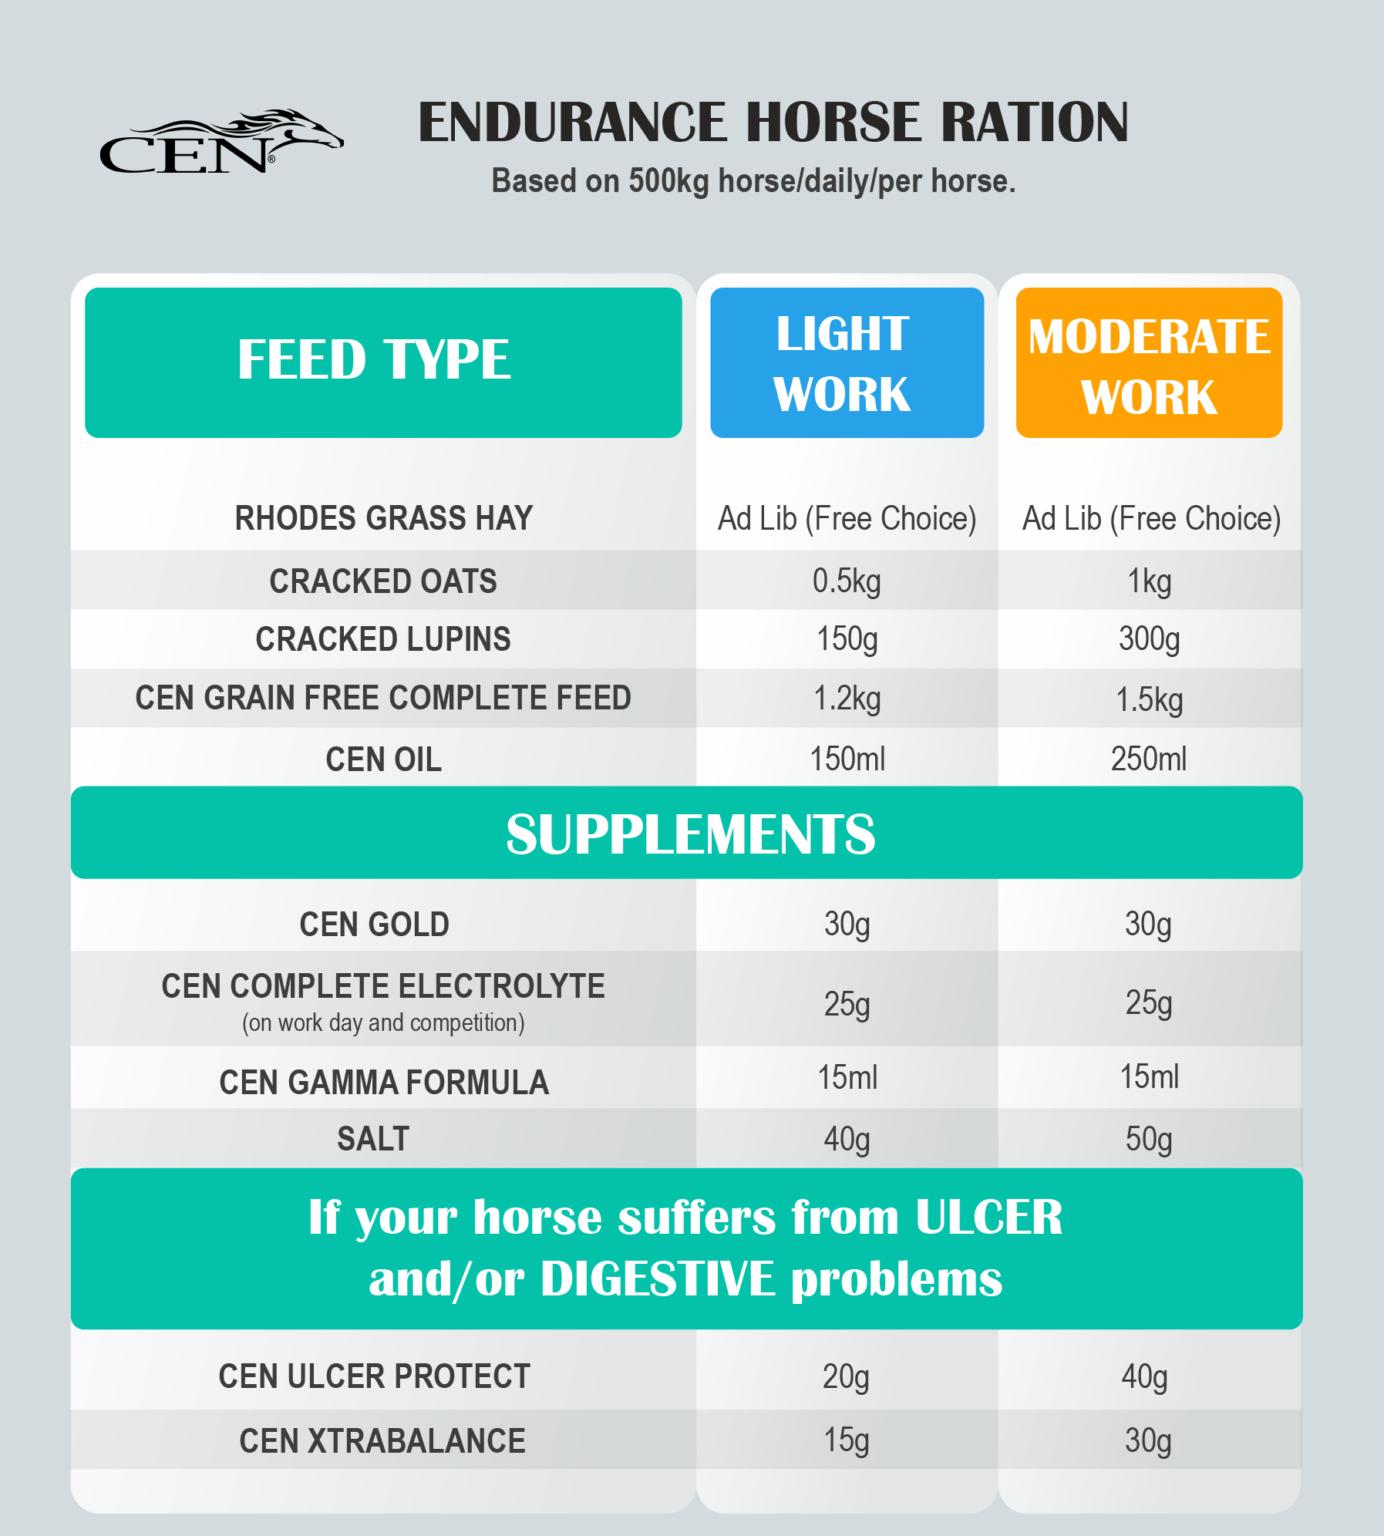 ENDURANCE-HORSES-TABLE-1